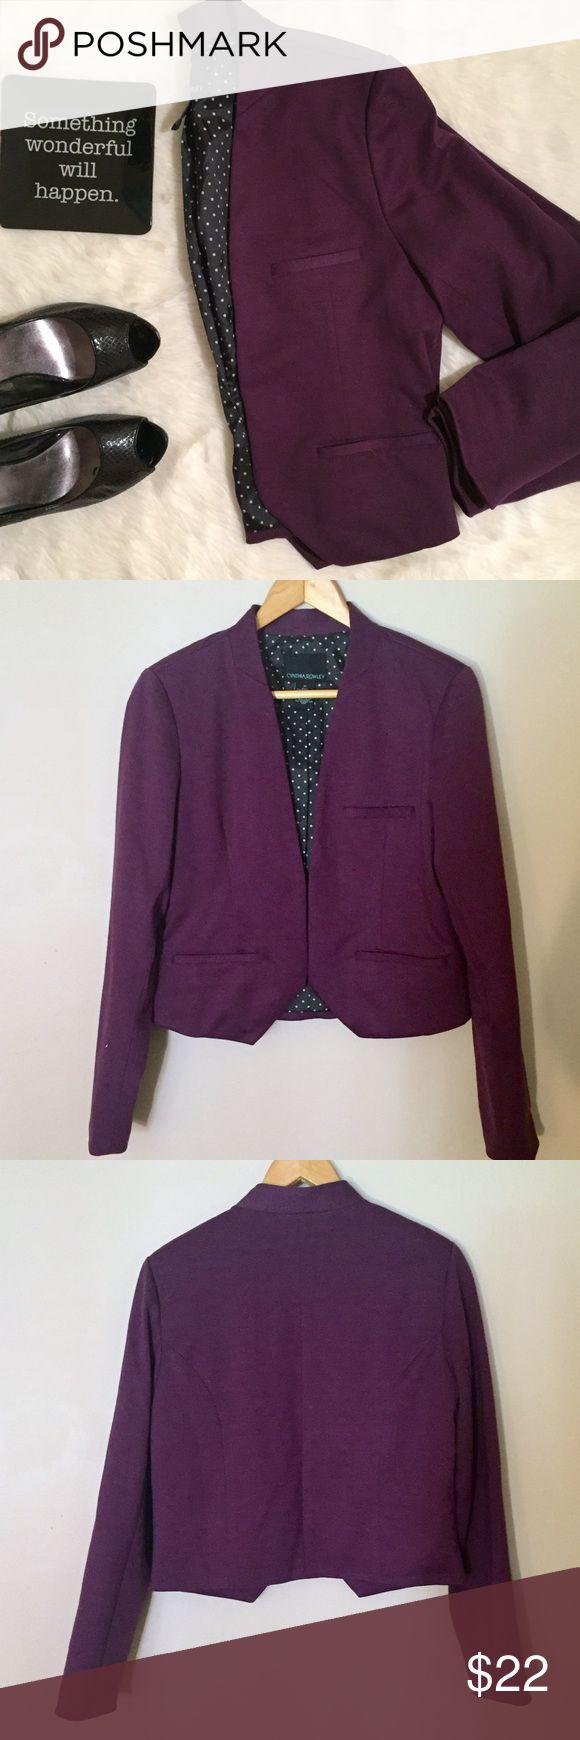 "Cynthia Rowley Open Blazer Purple blazer from Cynthia Rowley, open style - no front closure, has pockets. Black and white Polka Dot lining. 17.5"" across bust, 19.5"" length. EUC Cynthia Rowley Jackets & Coats Blazers"